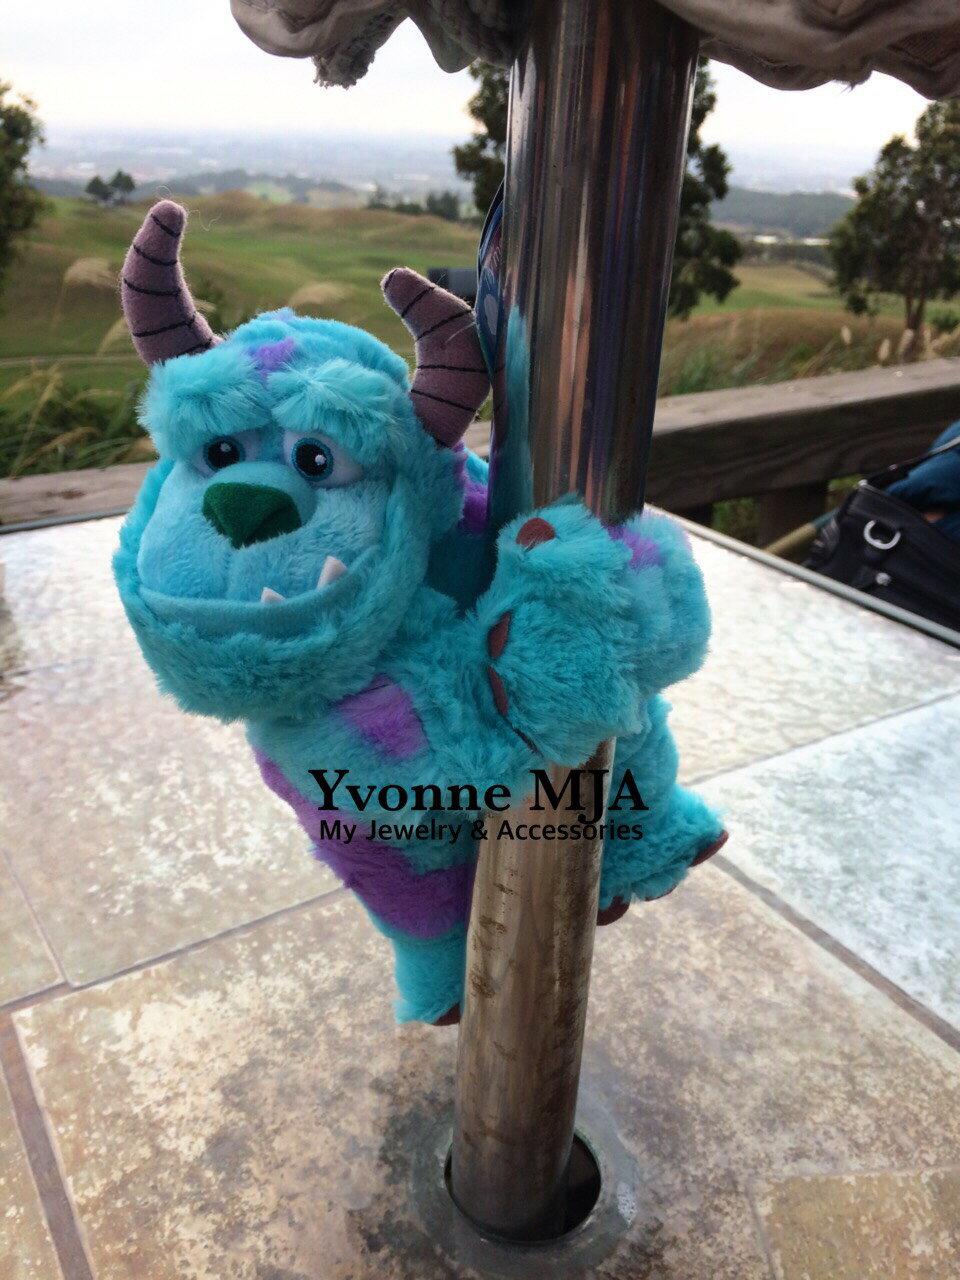 *Yvonne MJA*香港迪士尼Disney樂園限定正品怪獸大學毛怪特別版捲尺手可懸吊Q版娃娃